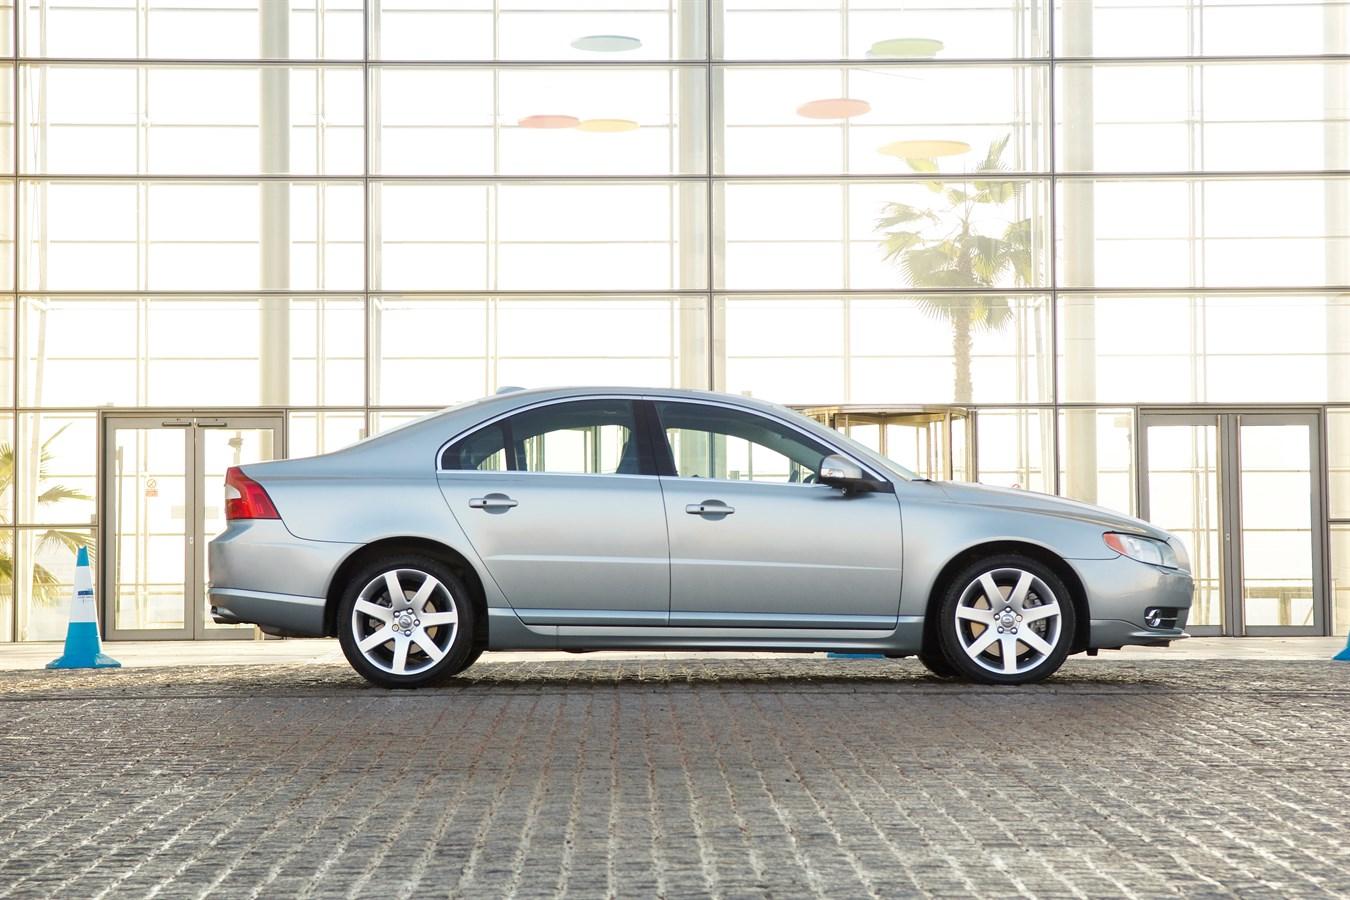 Volvo S80 Model Year 2009 Car Uk Media Newsroom O2 Sensor Location Interior Design